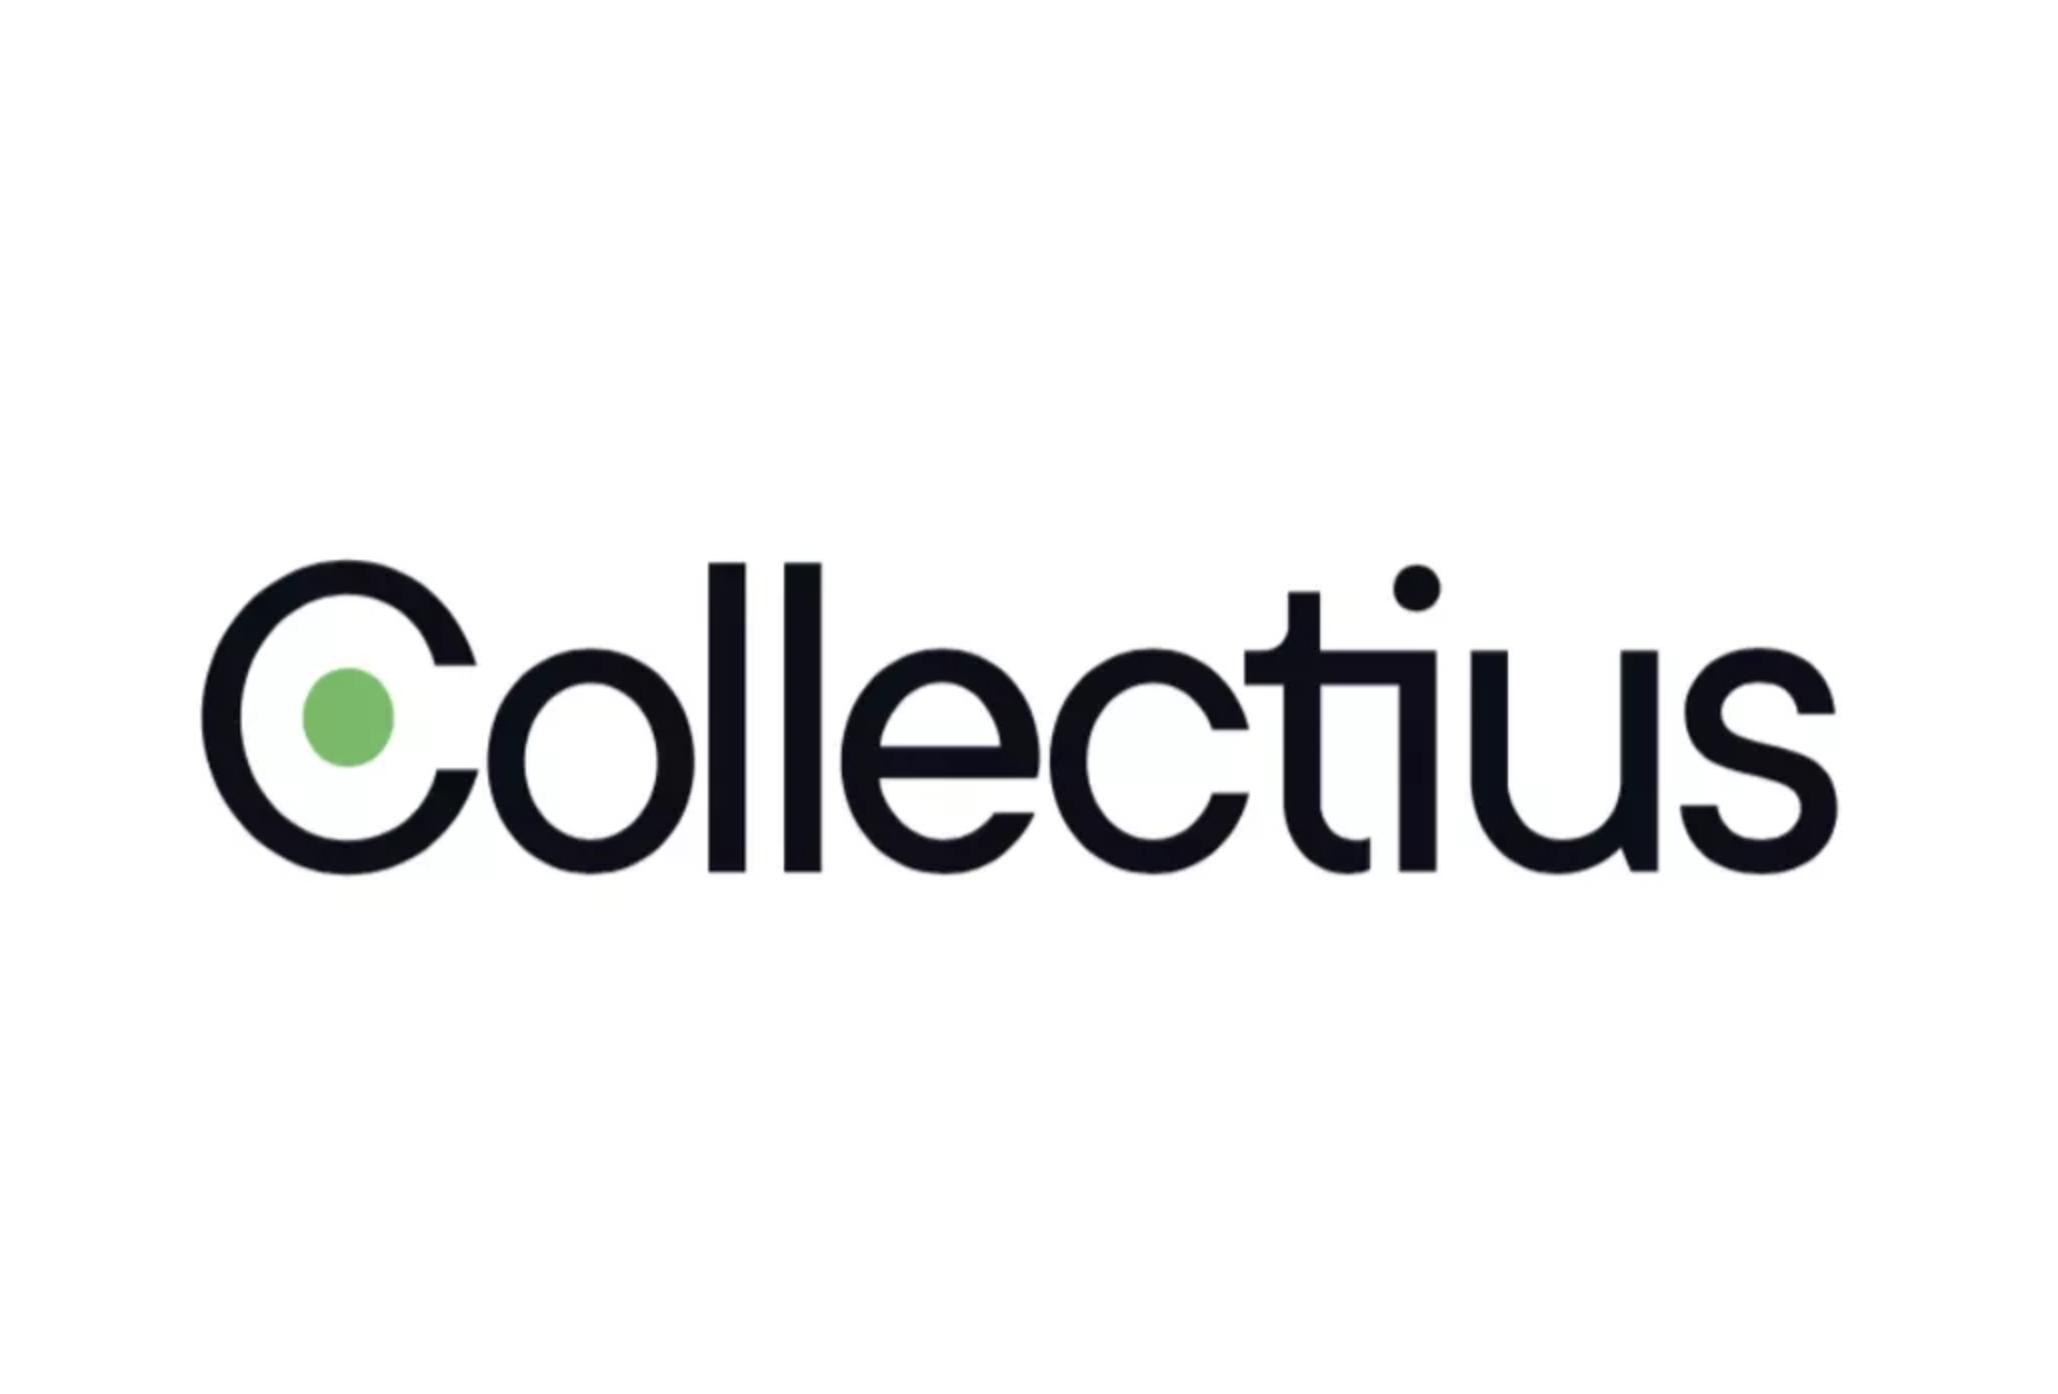 Collectius